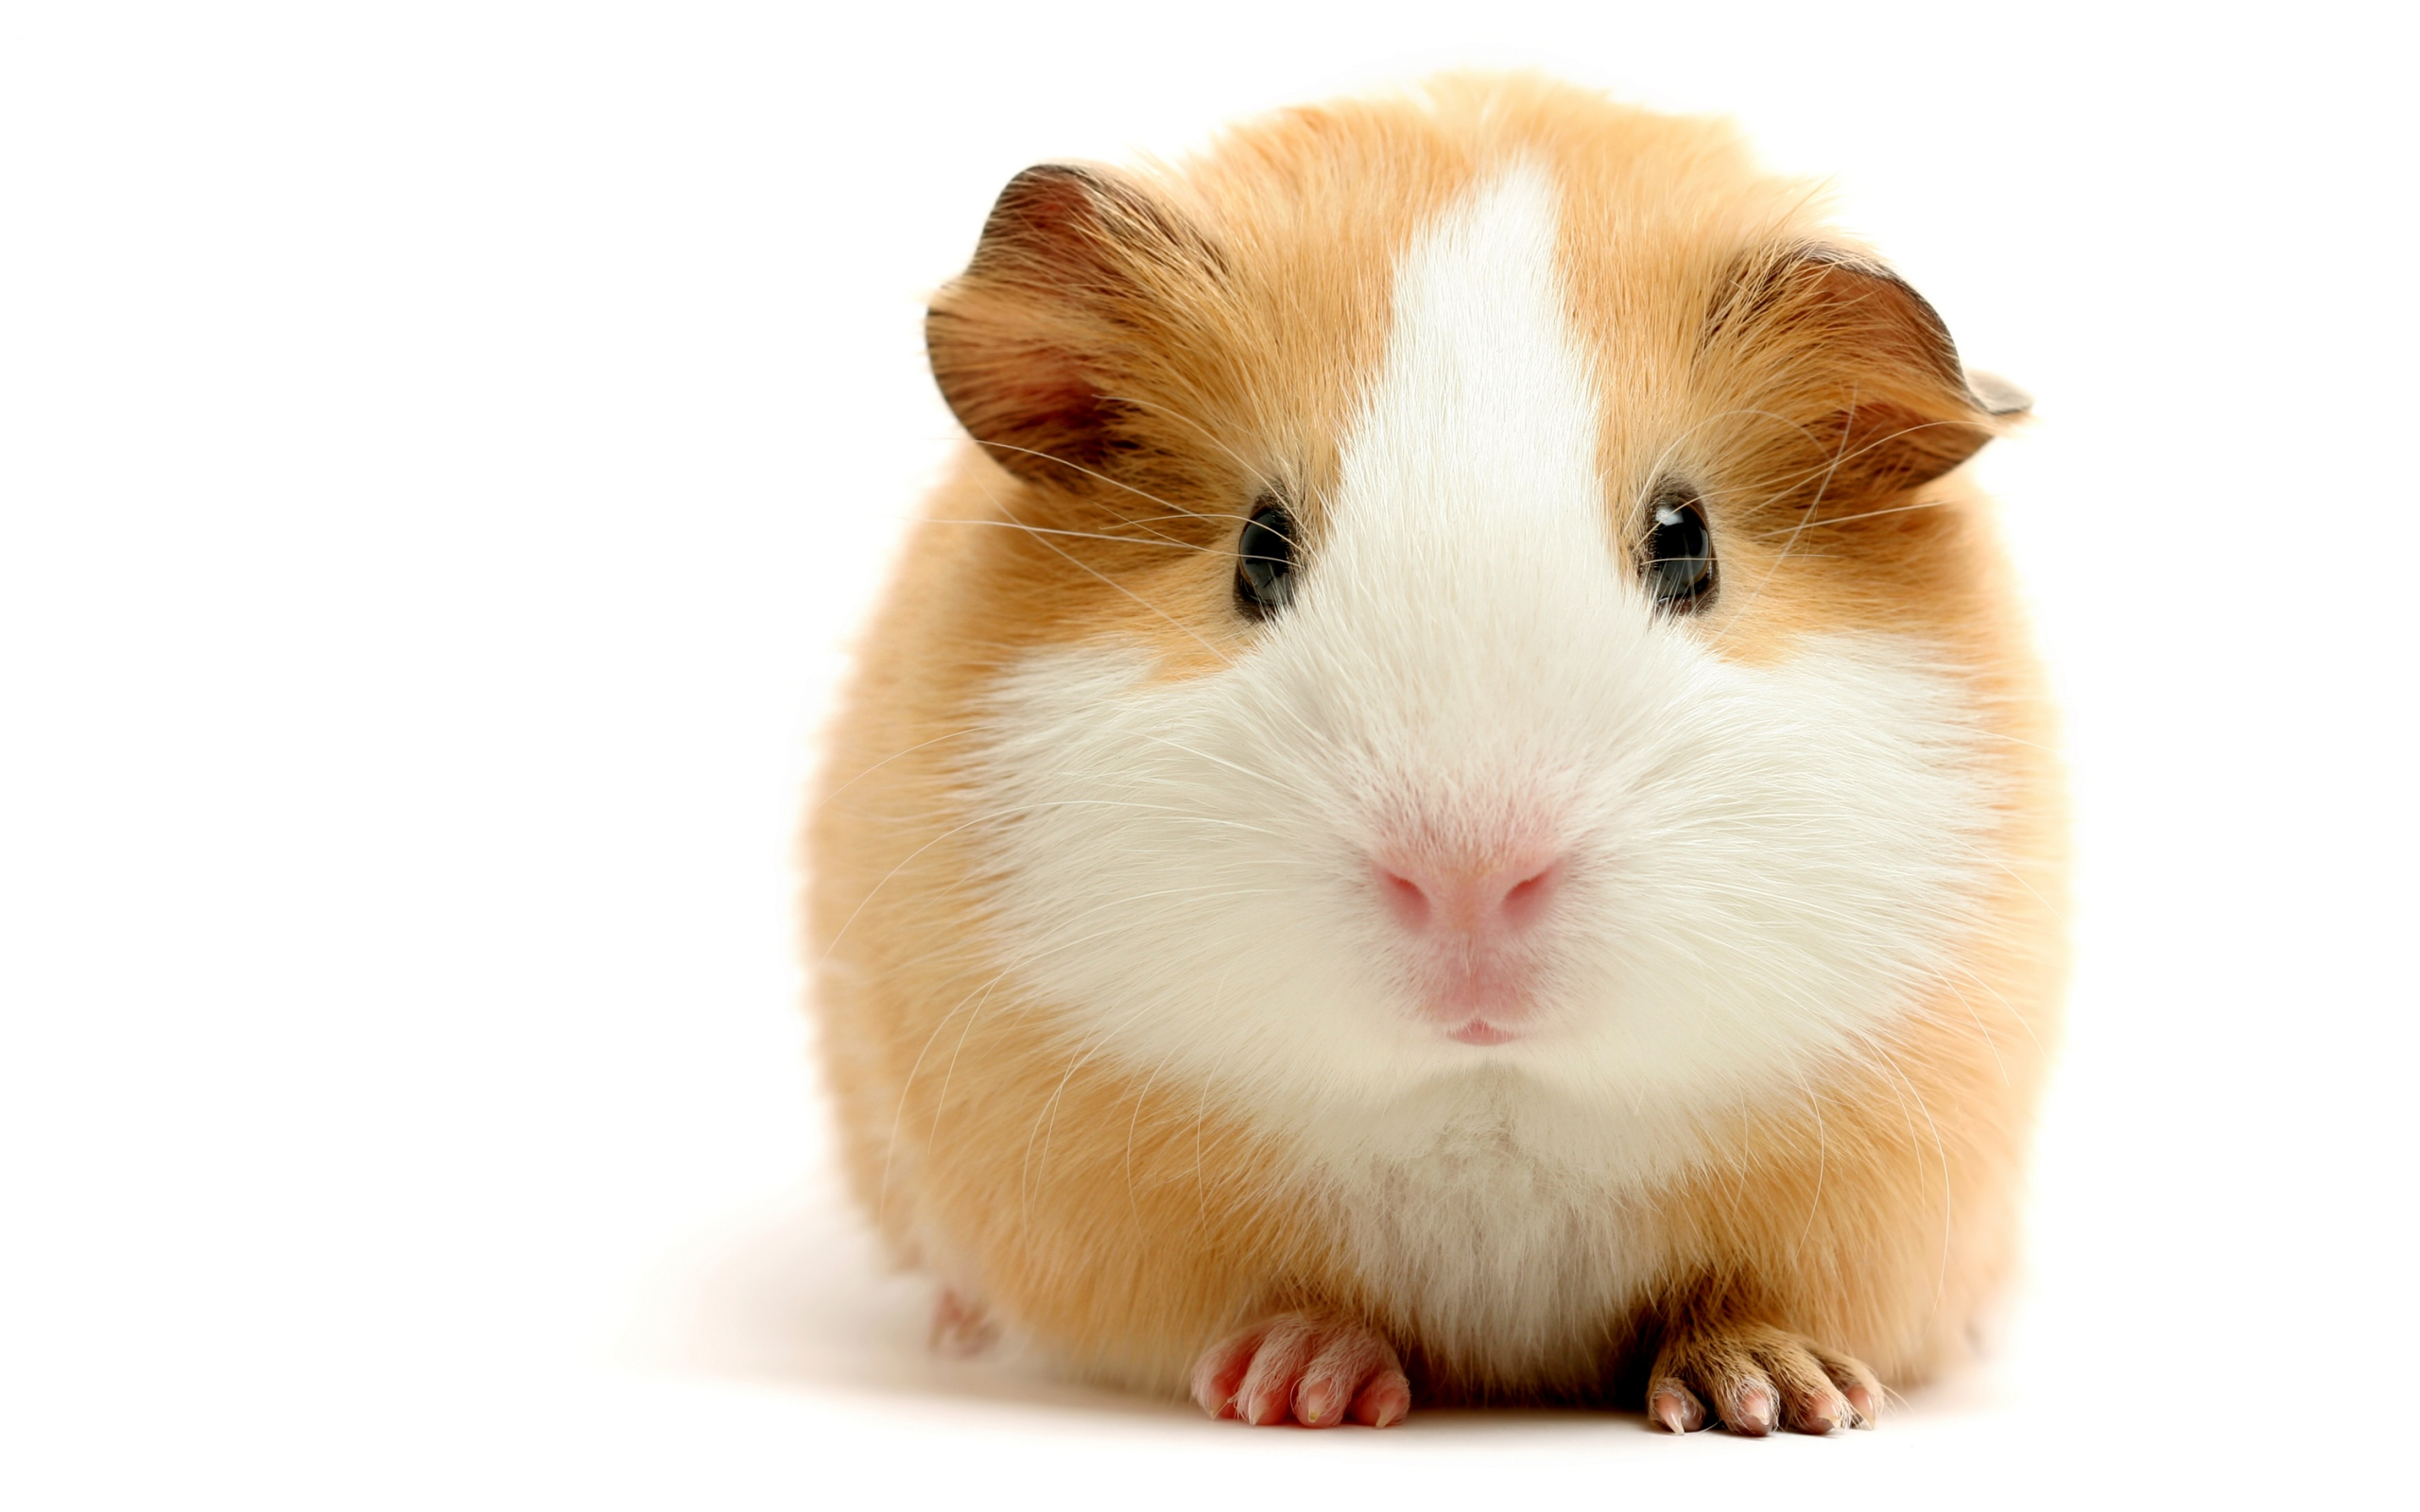 Hamster Wallpaper 2560x1600 2560x1600